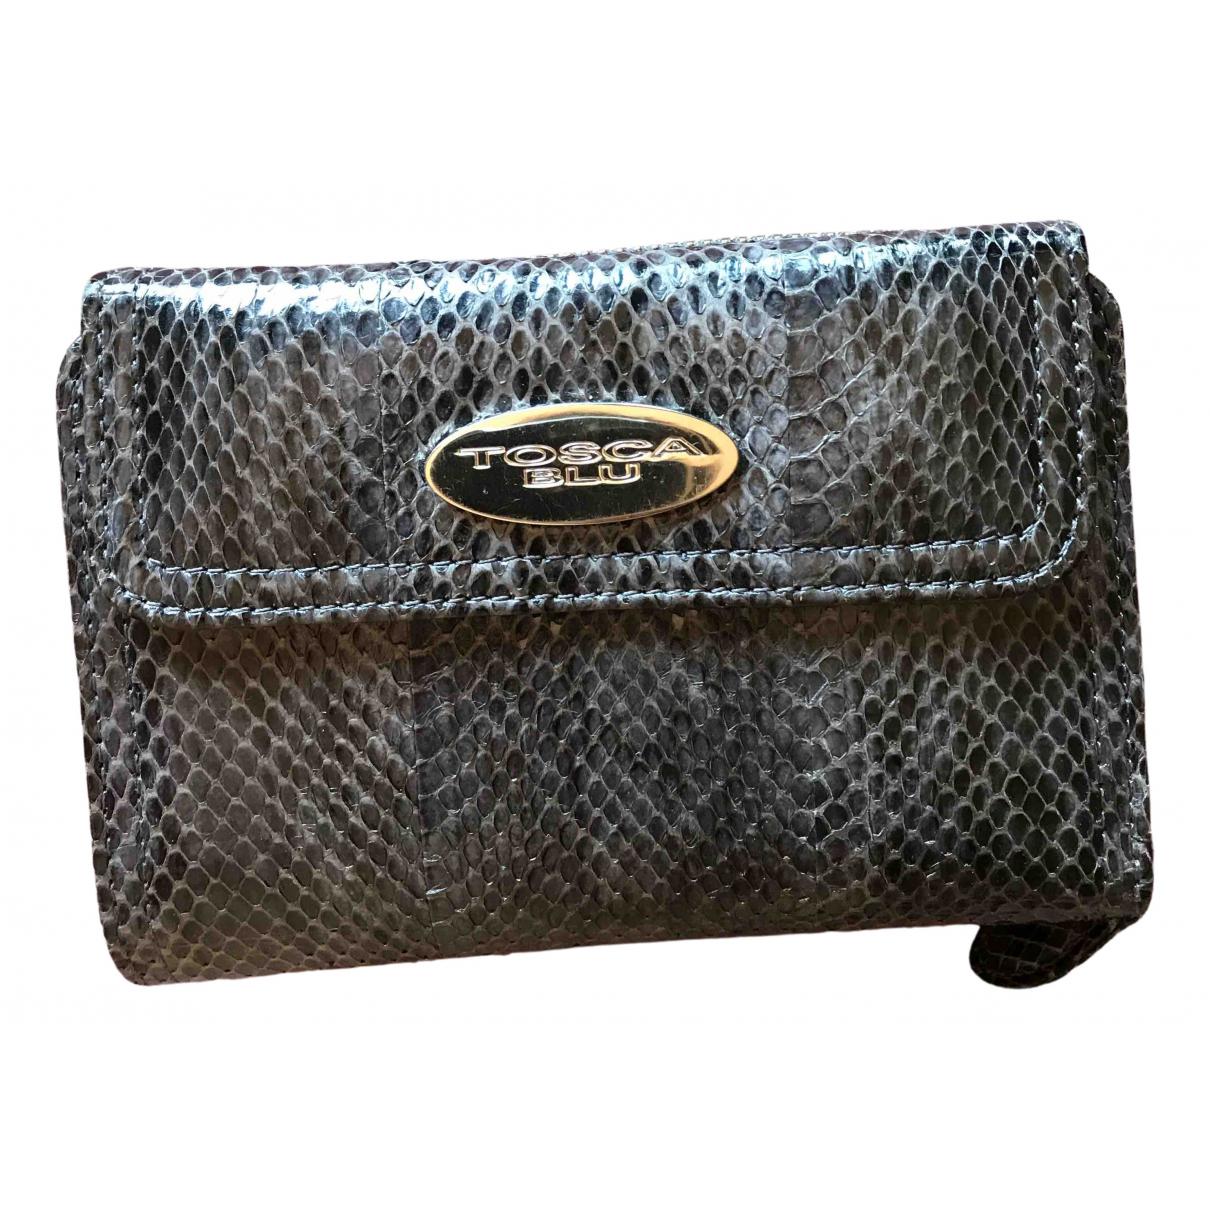 Tosca Blu - Portefeuille   pour femme en python - anthracite